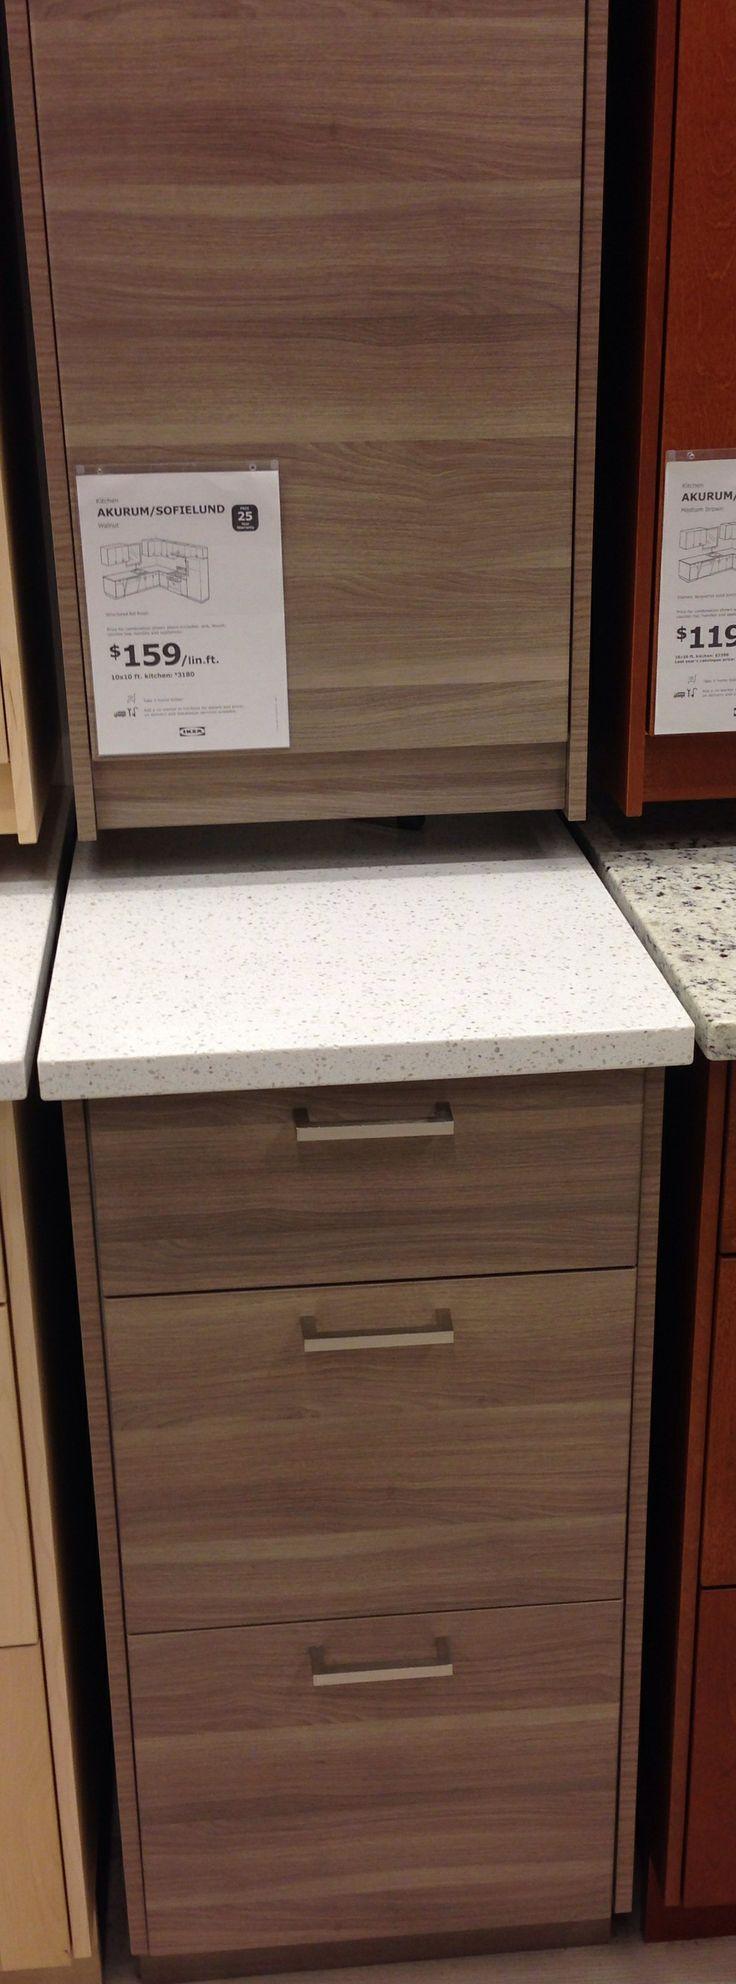 Ikea Walnut Cabinets Mission Kitchen Pinterest Cabinets Ikea And Walnut Cabinets